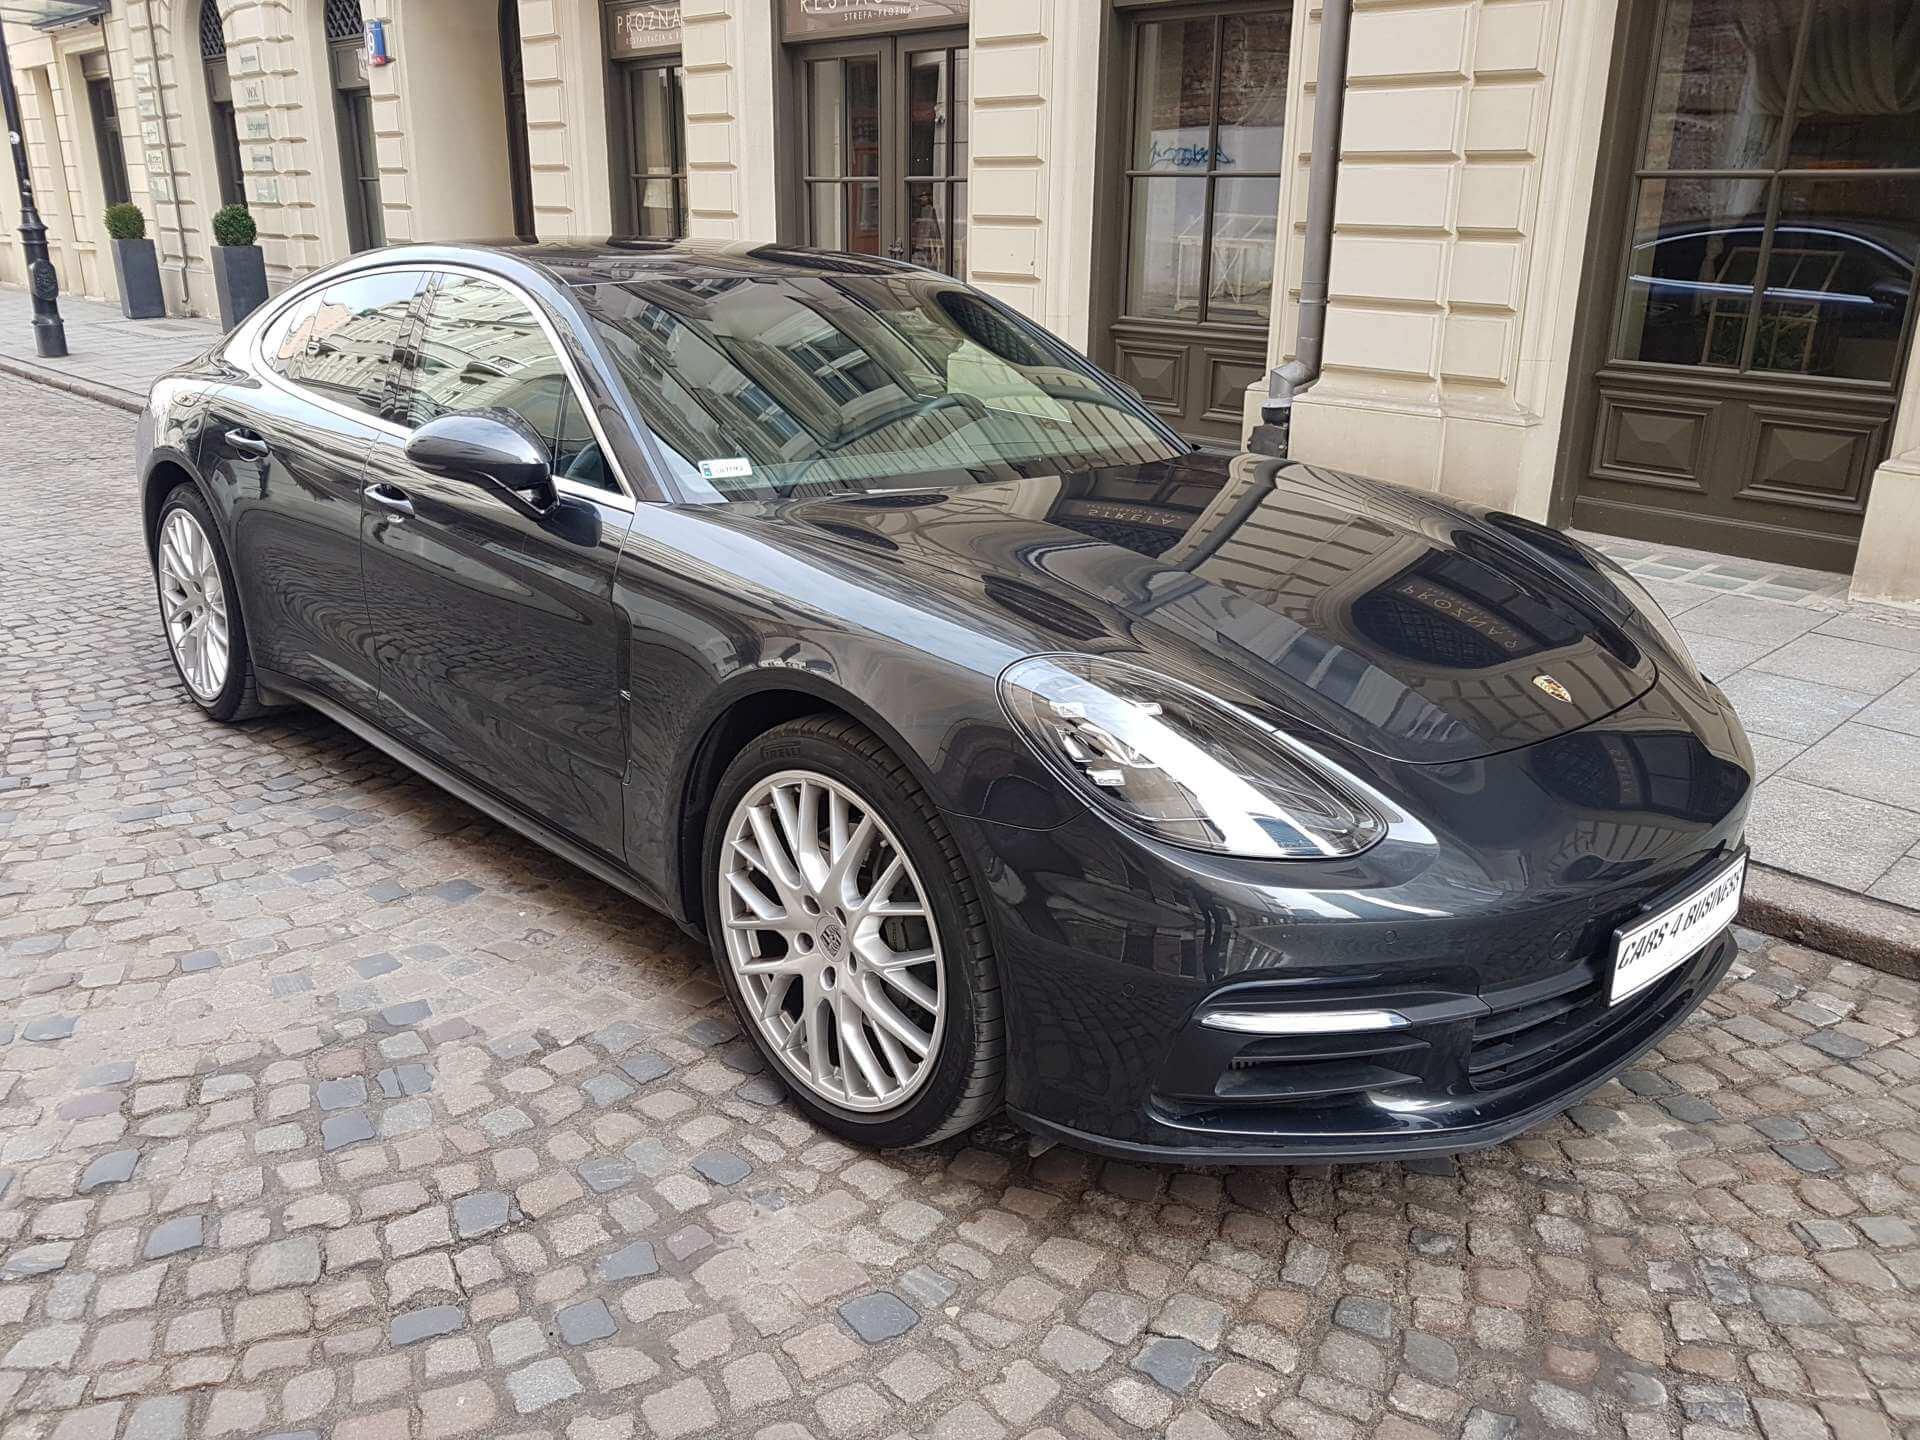 https://cars4business.pl/wp-content/uploads/2018/04/porhe-panamera-4s-cars4buisness-2.jpg